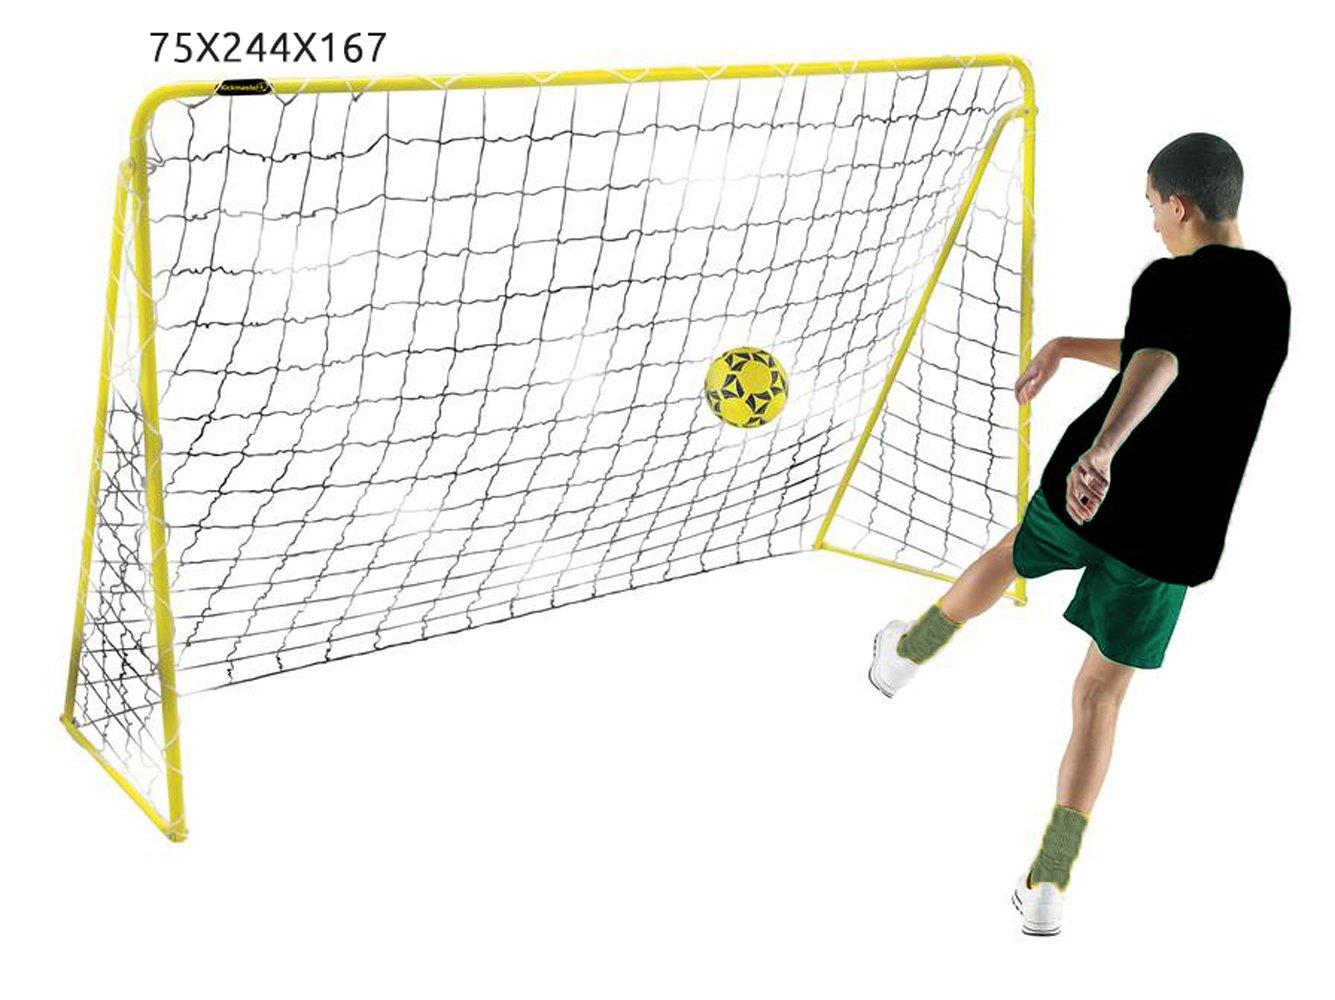 Kickmaster 8 ft Premierゴールボールゲームby Kickmaster B00HN50FIC